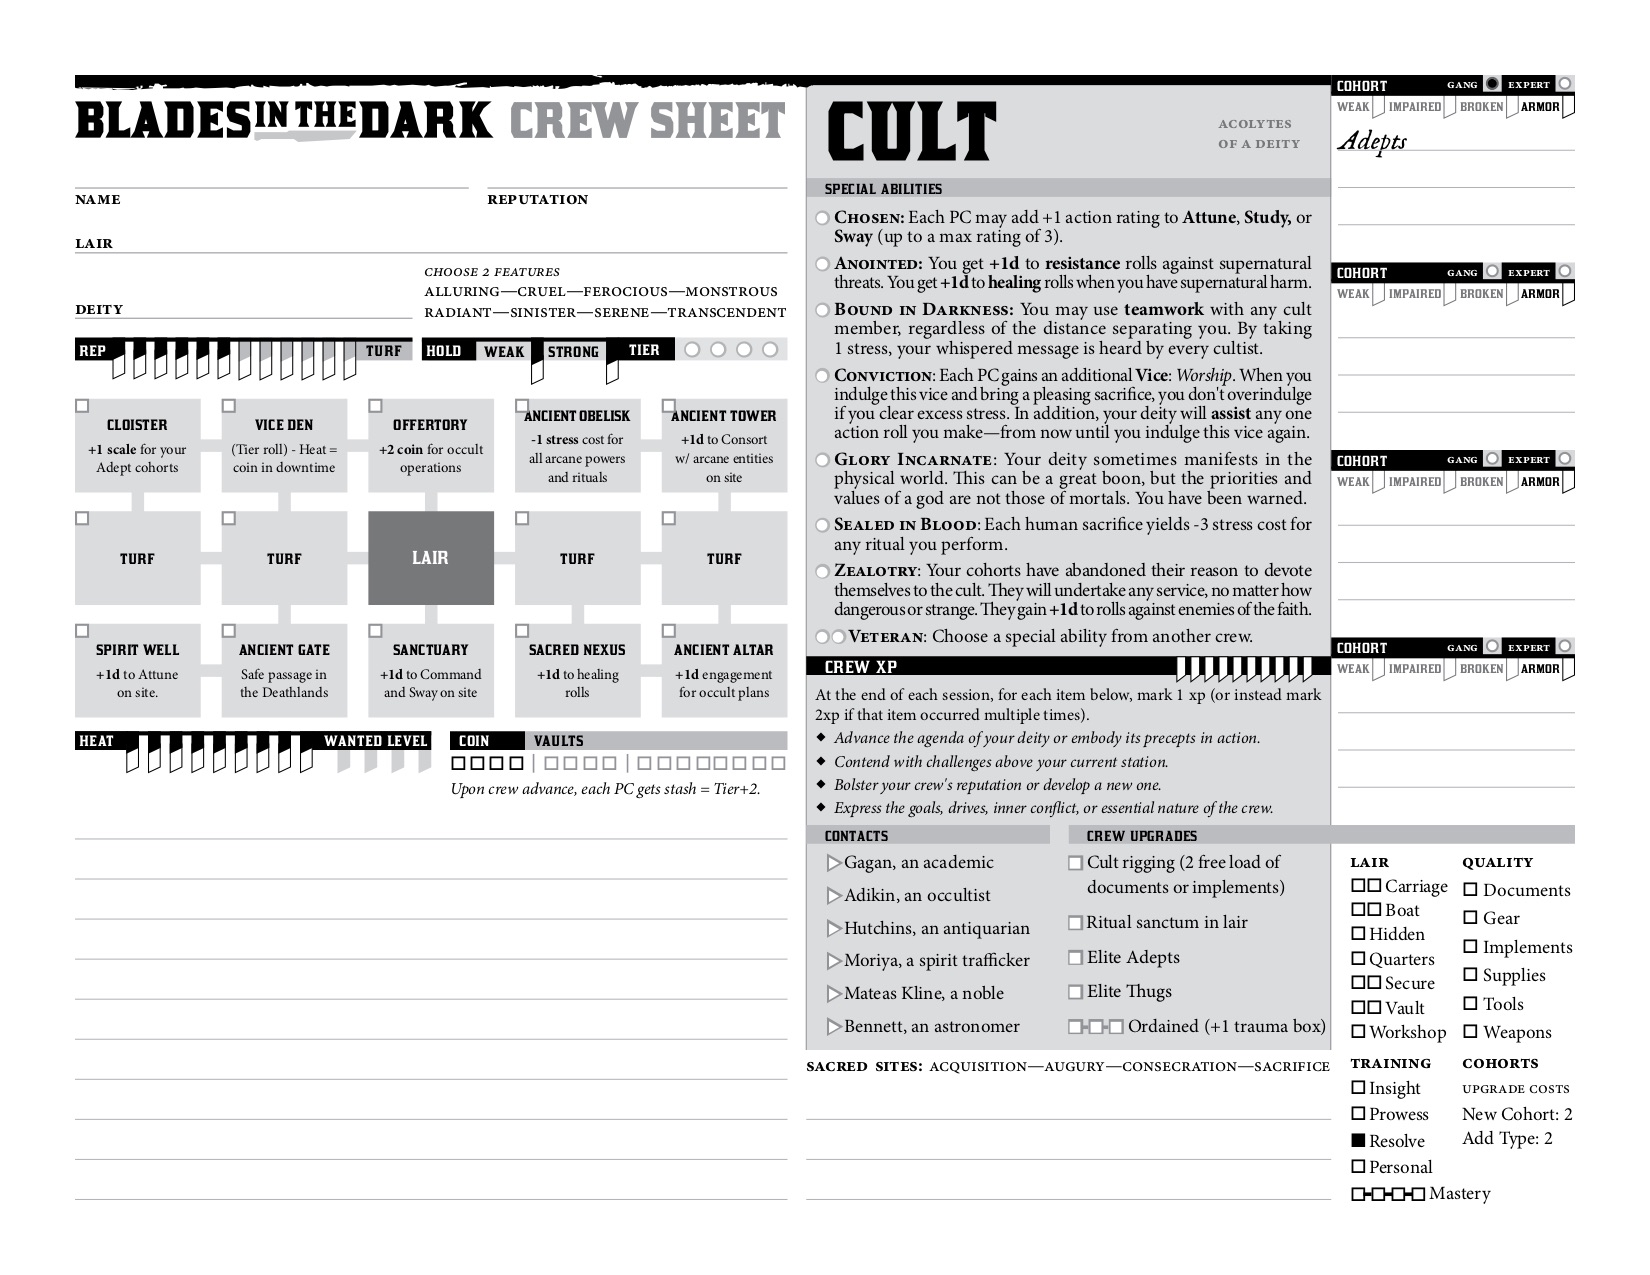 crewsheet-cult.jpg